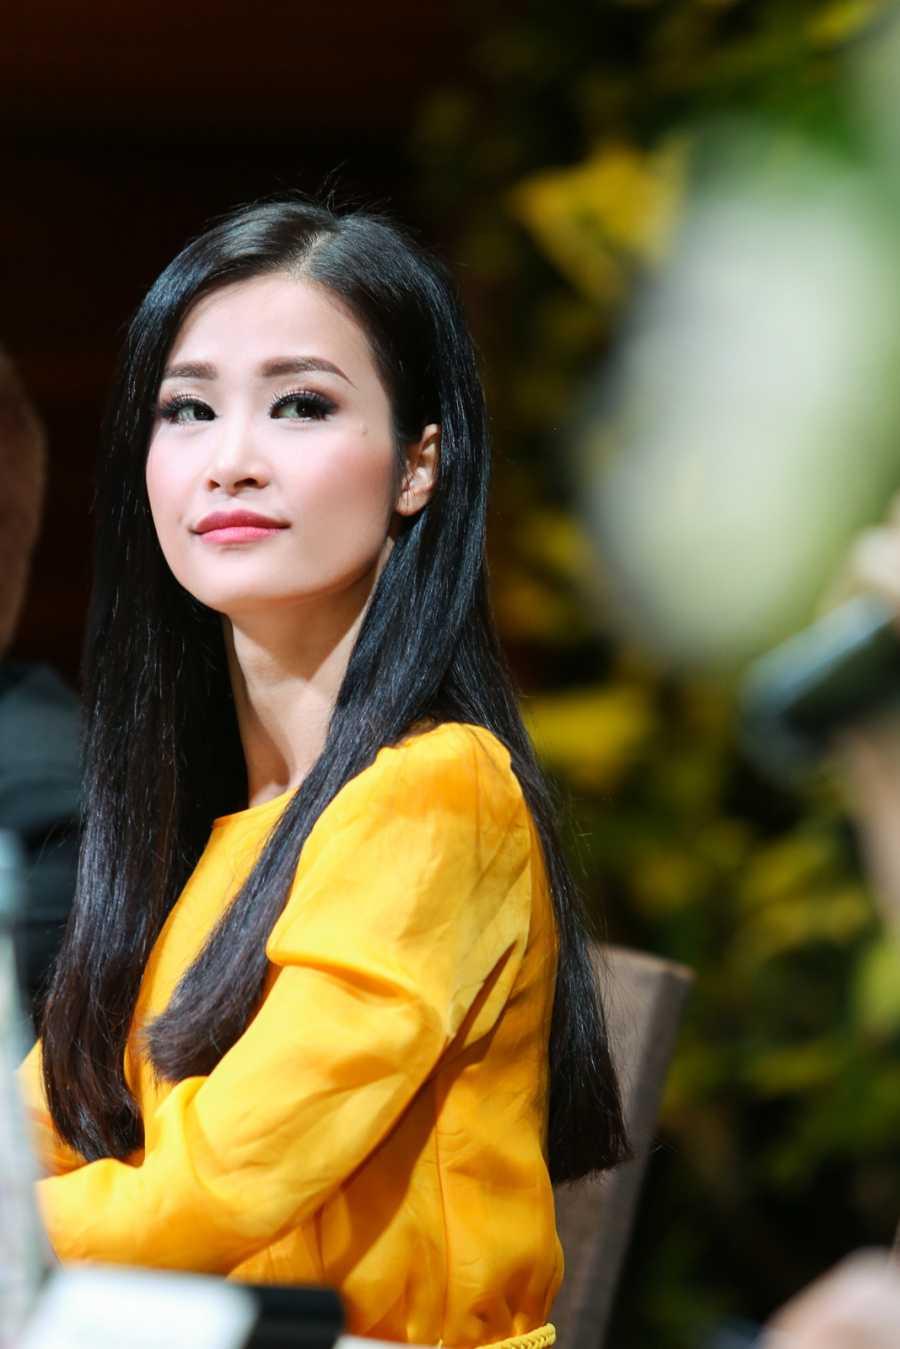 Dong Nhi lam liveshow dau tien sau 8 nam ca hat tai san van dong hinh anh 2